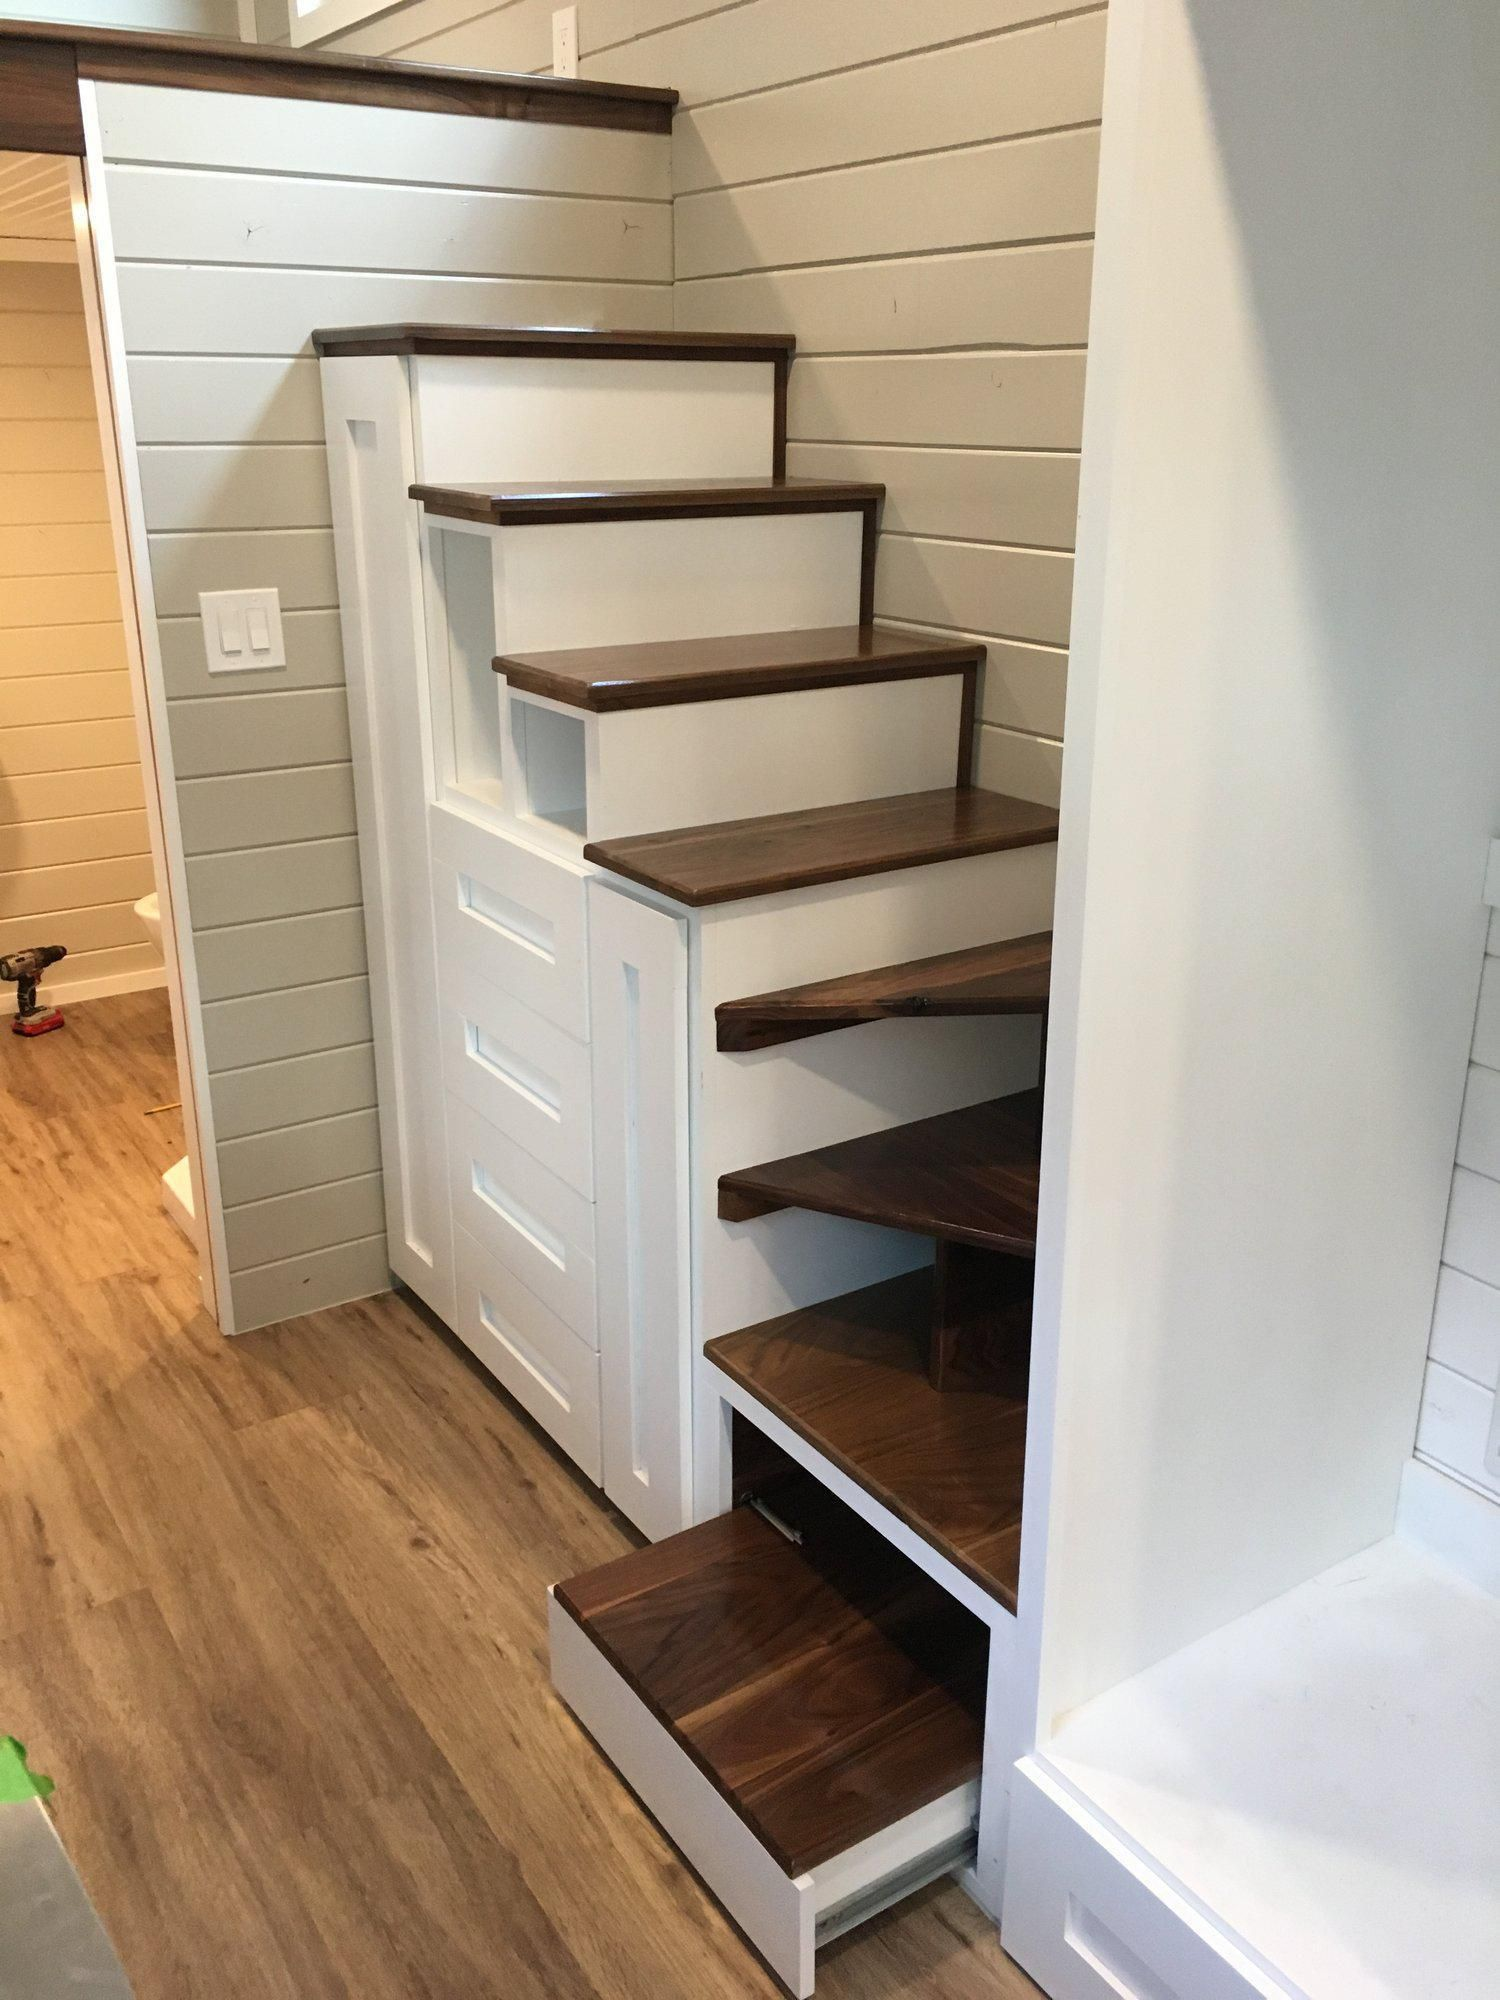 30' Tiny House with King Size Bed Loft Tiny house